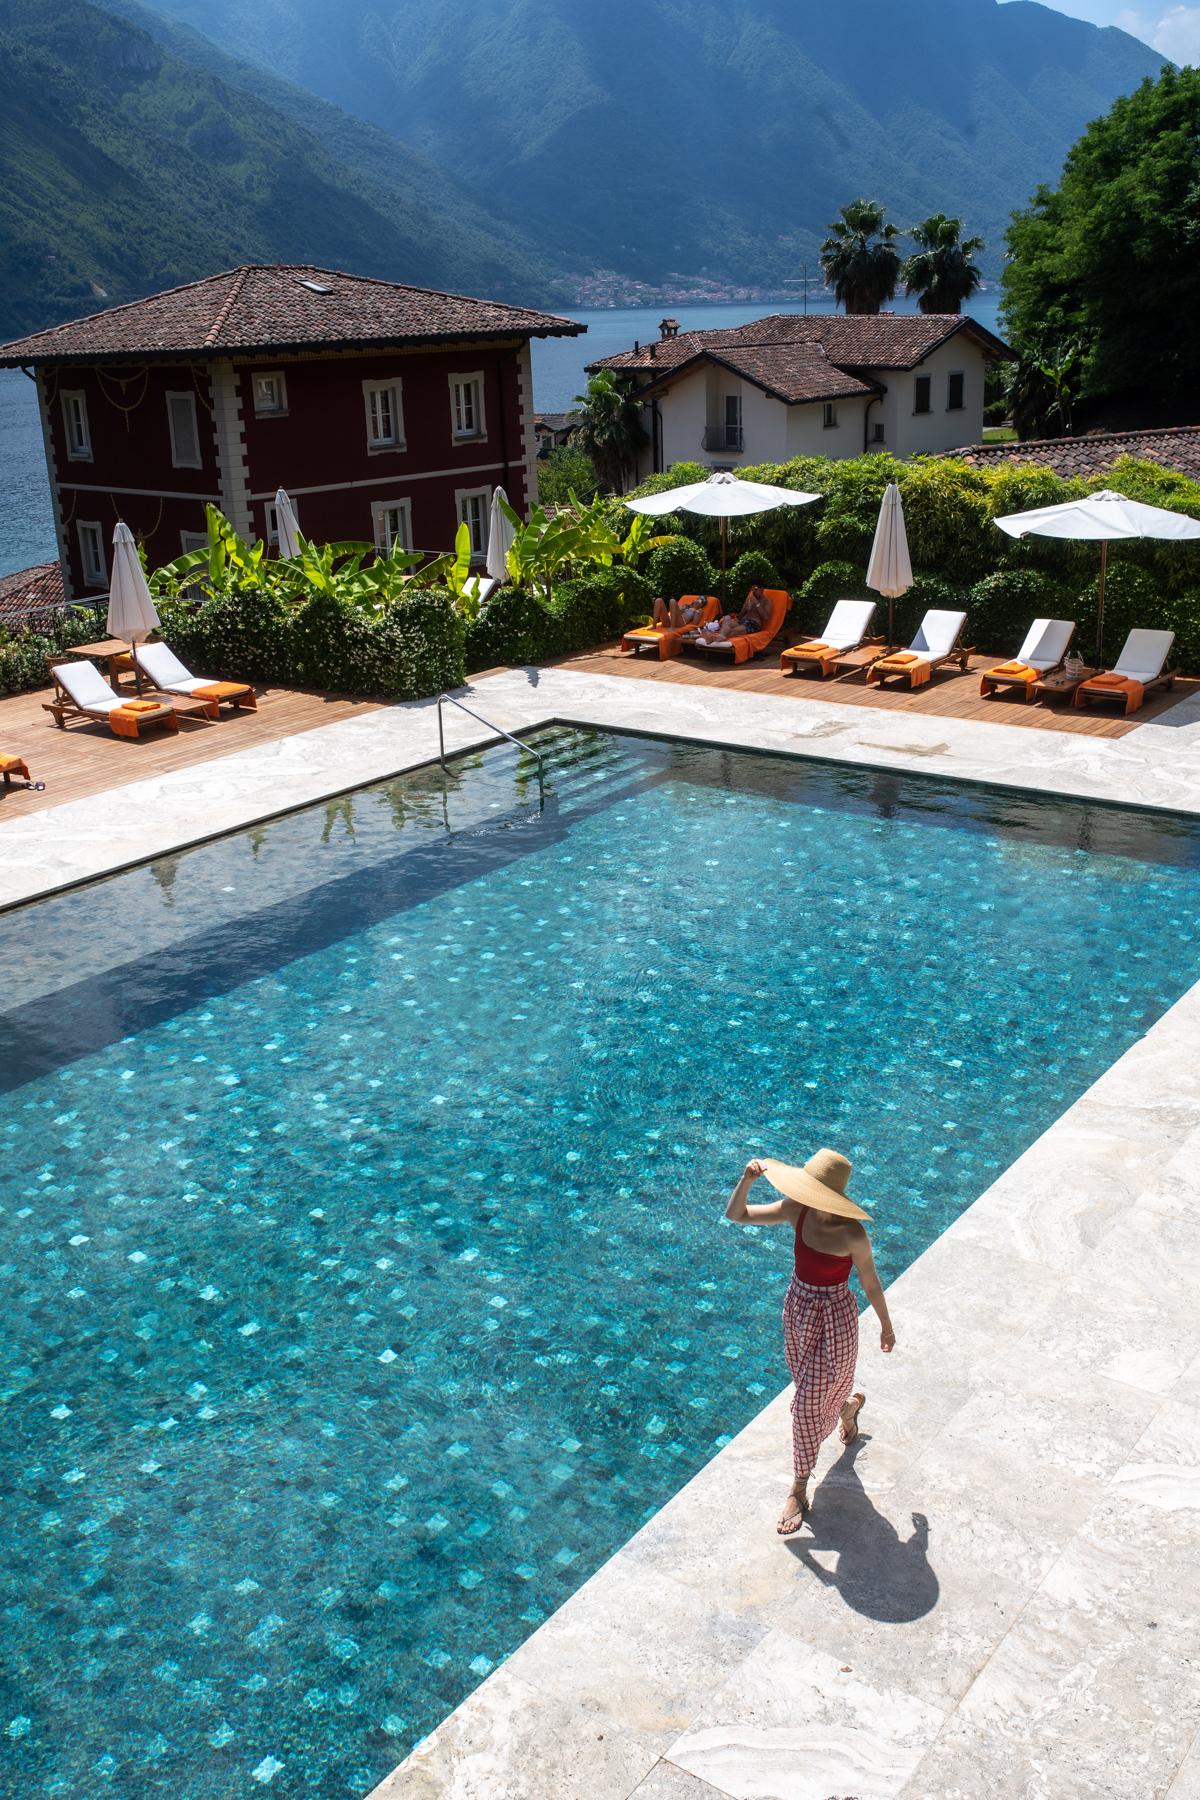 Stacie Flinner x Grand Hotel Tremezzo x Maupin Travel-77.jpg